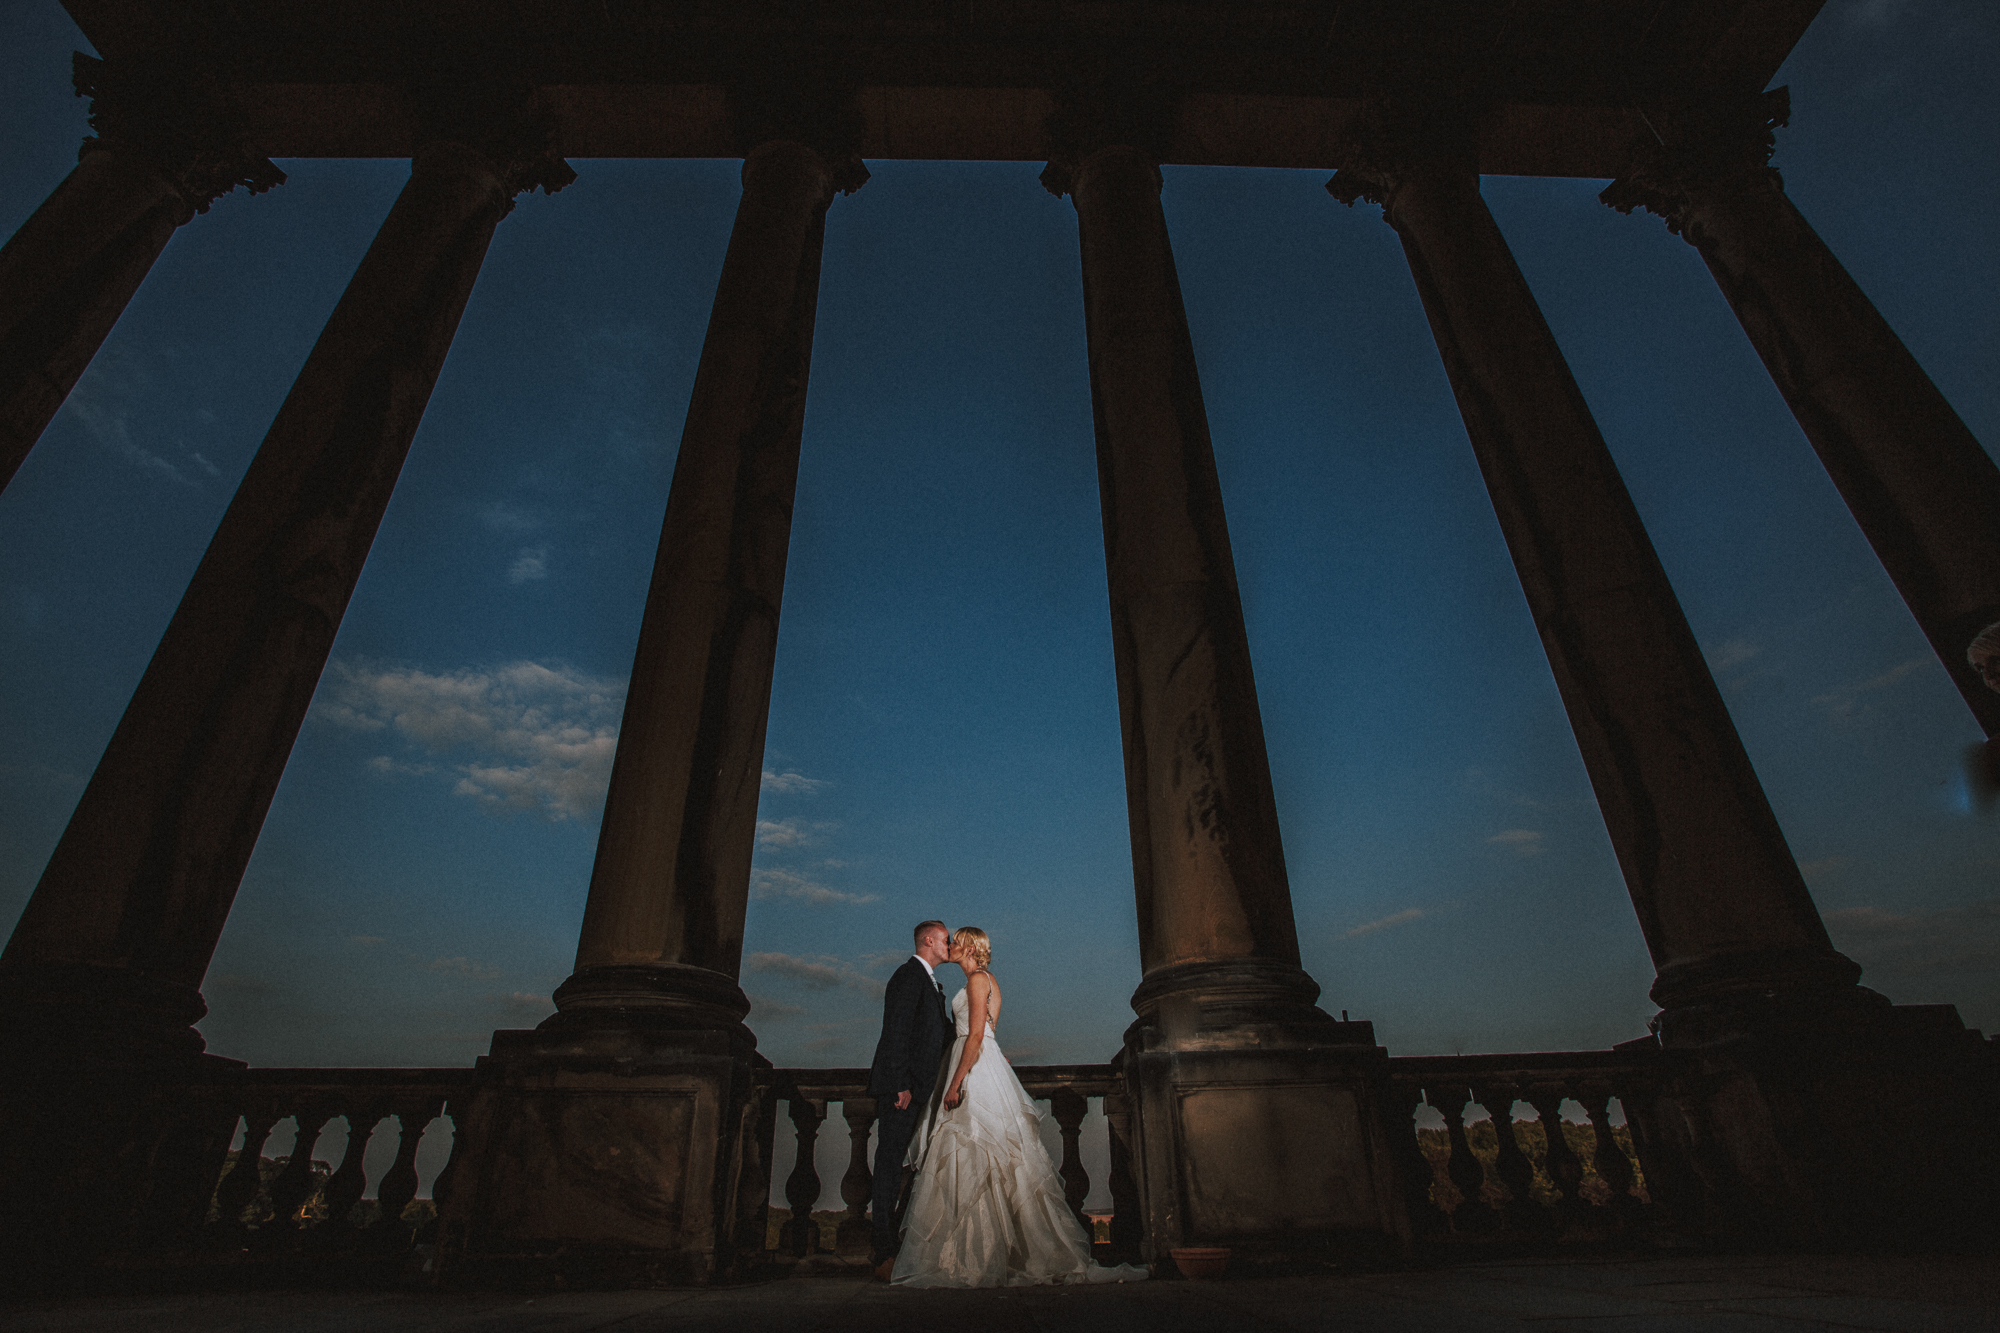 wentworth woodhouse weddings photographer-67.jpg